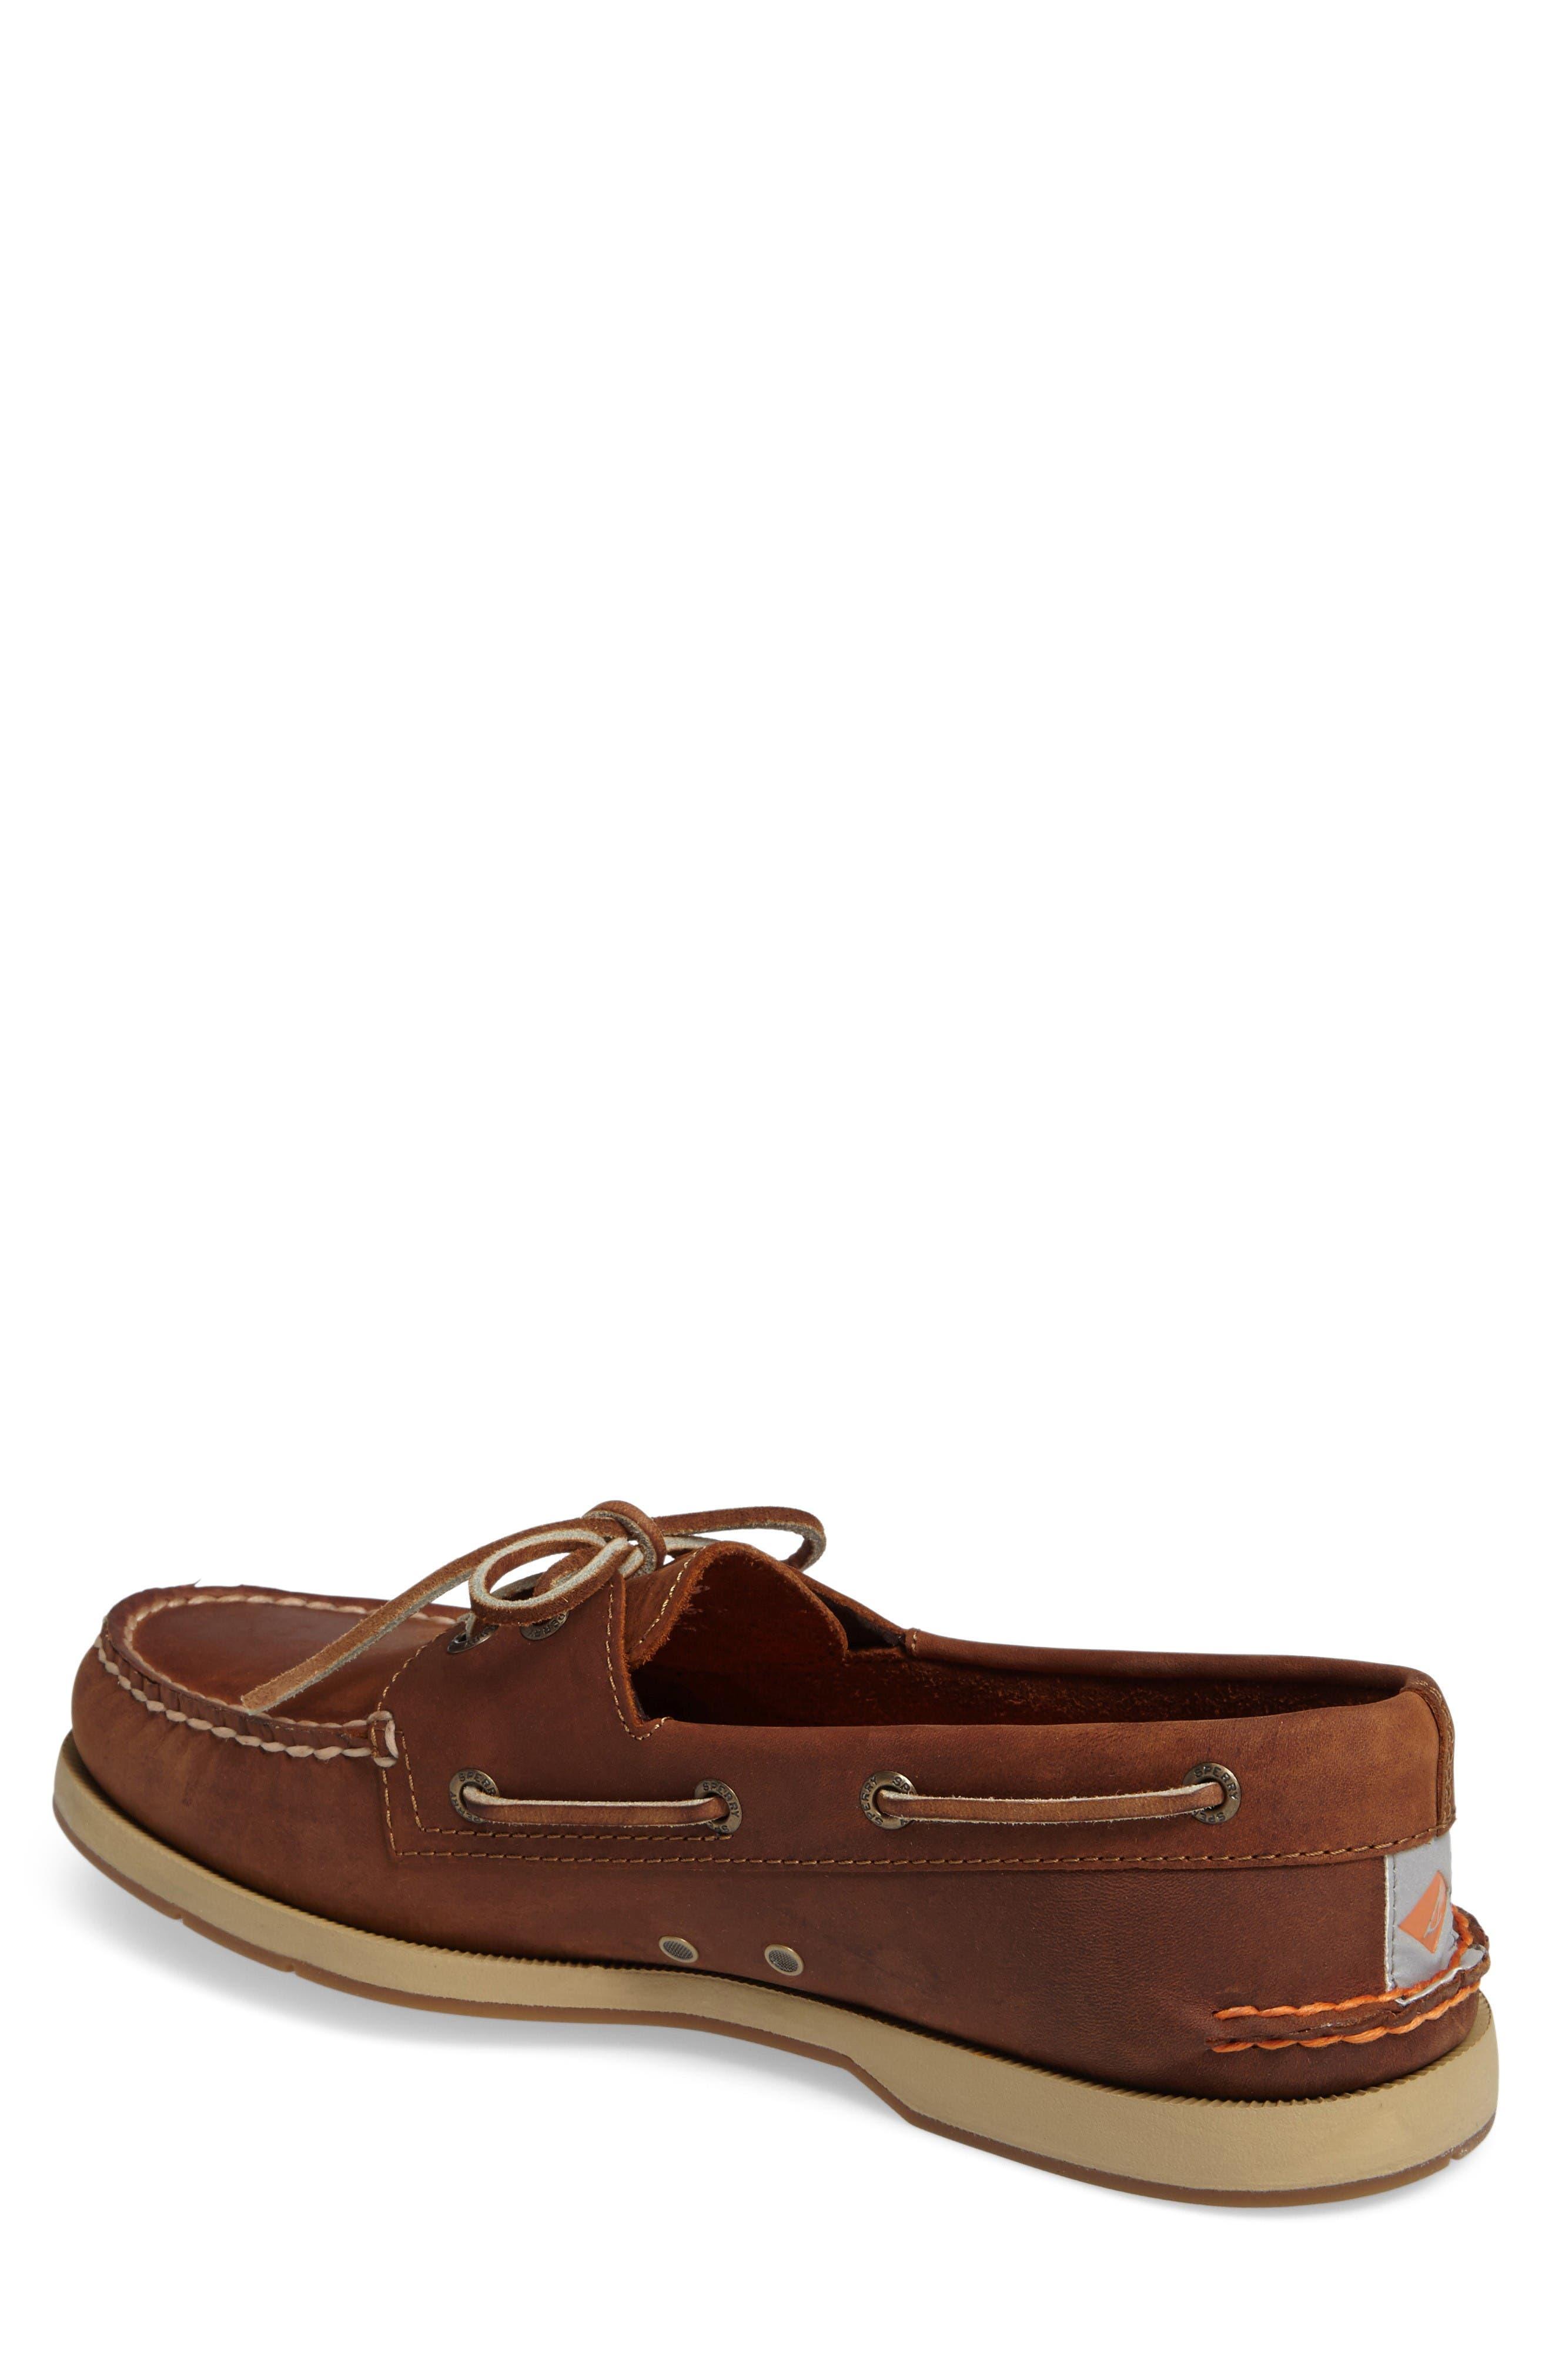 Alternate Image 2  - Sperry Captain's Authentic Original Boat Shoe (Men)